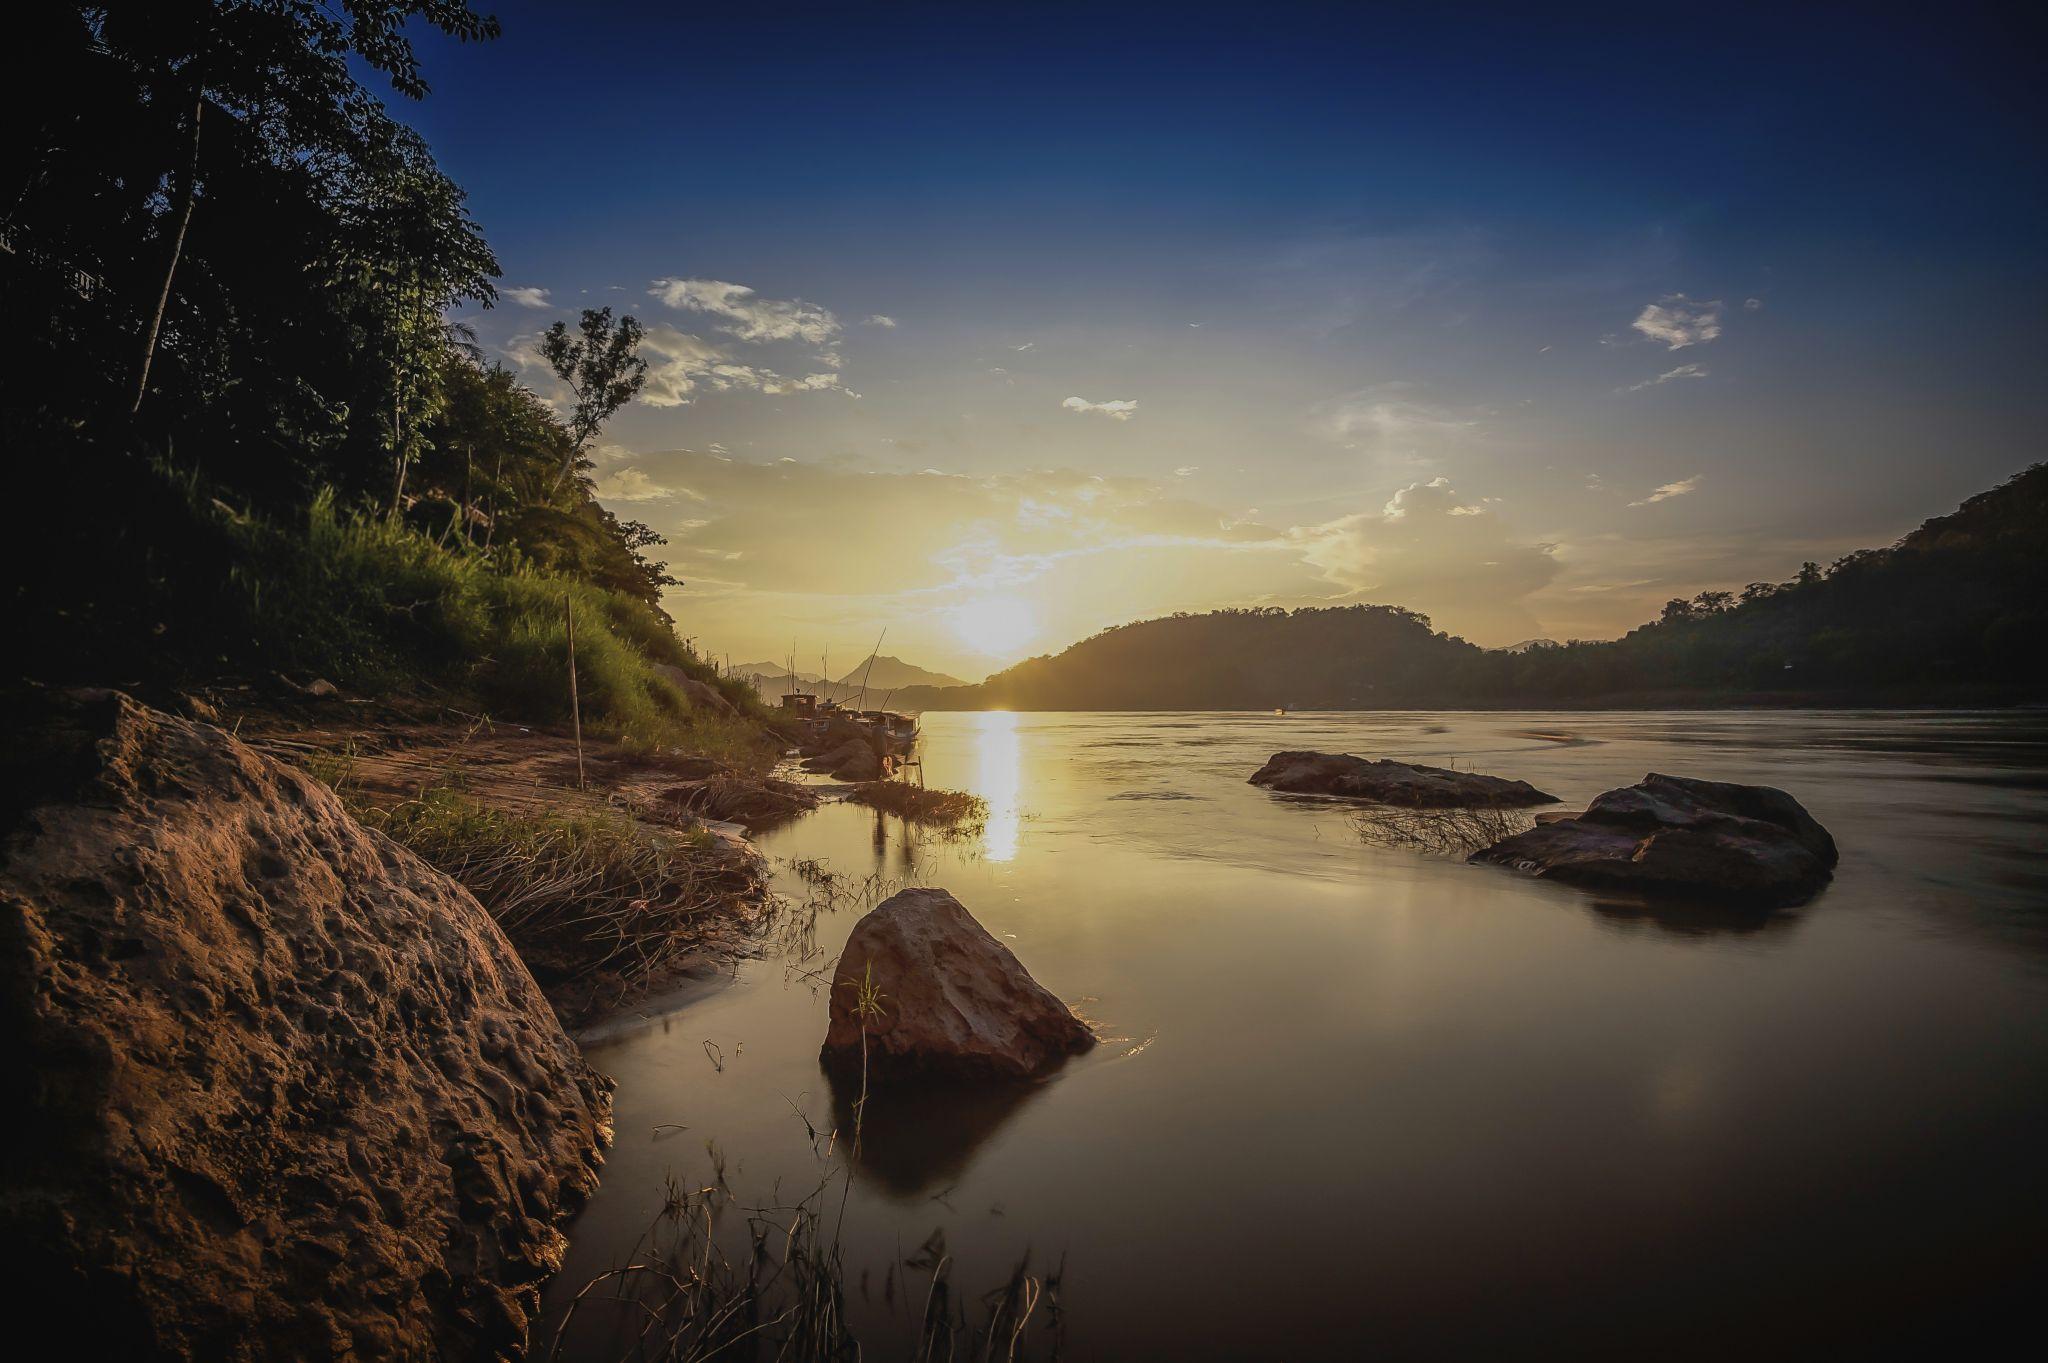 Mekong in Luangprabang, Laos, Asia, Lao